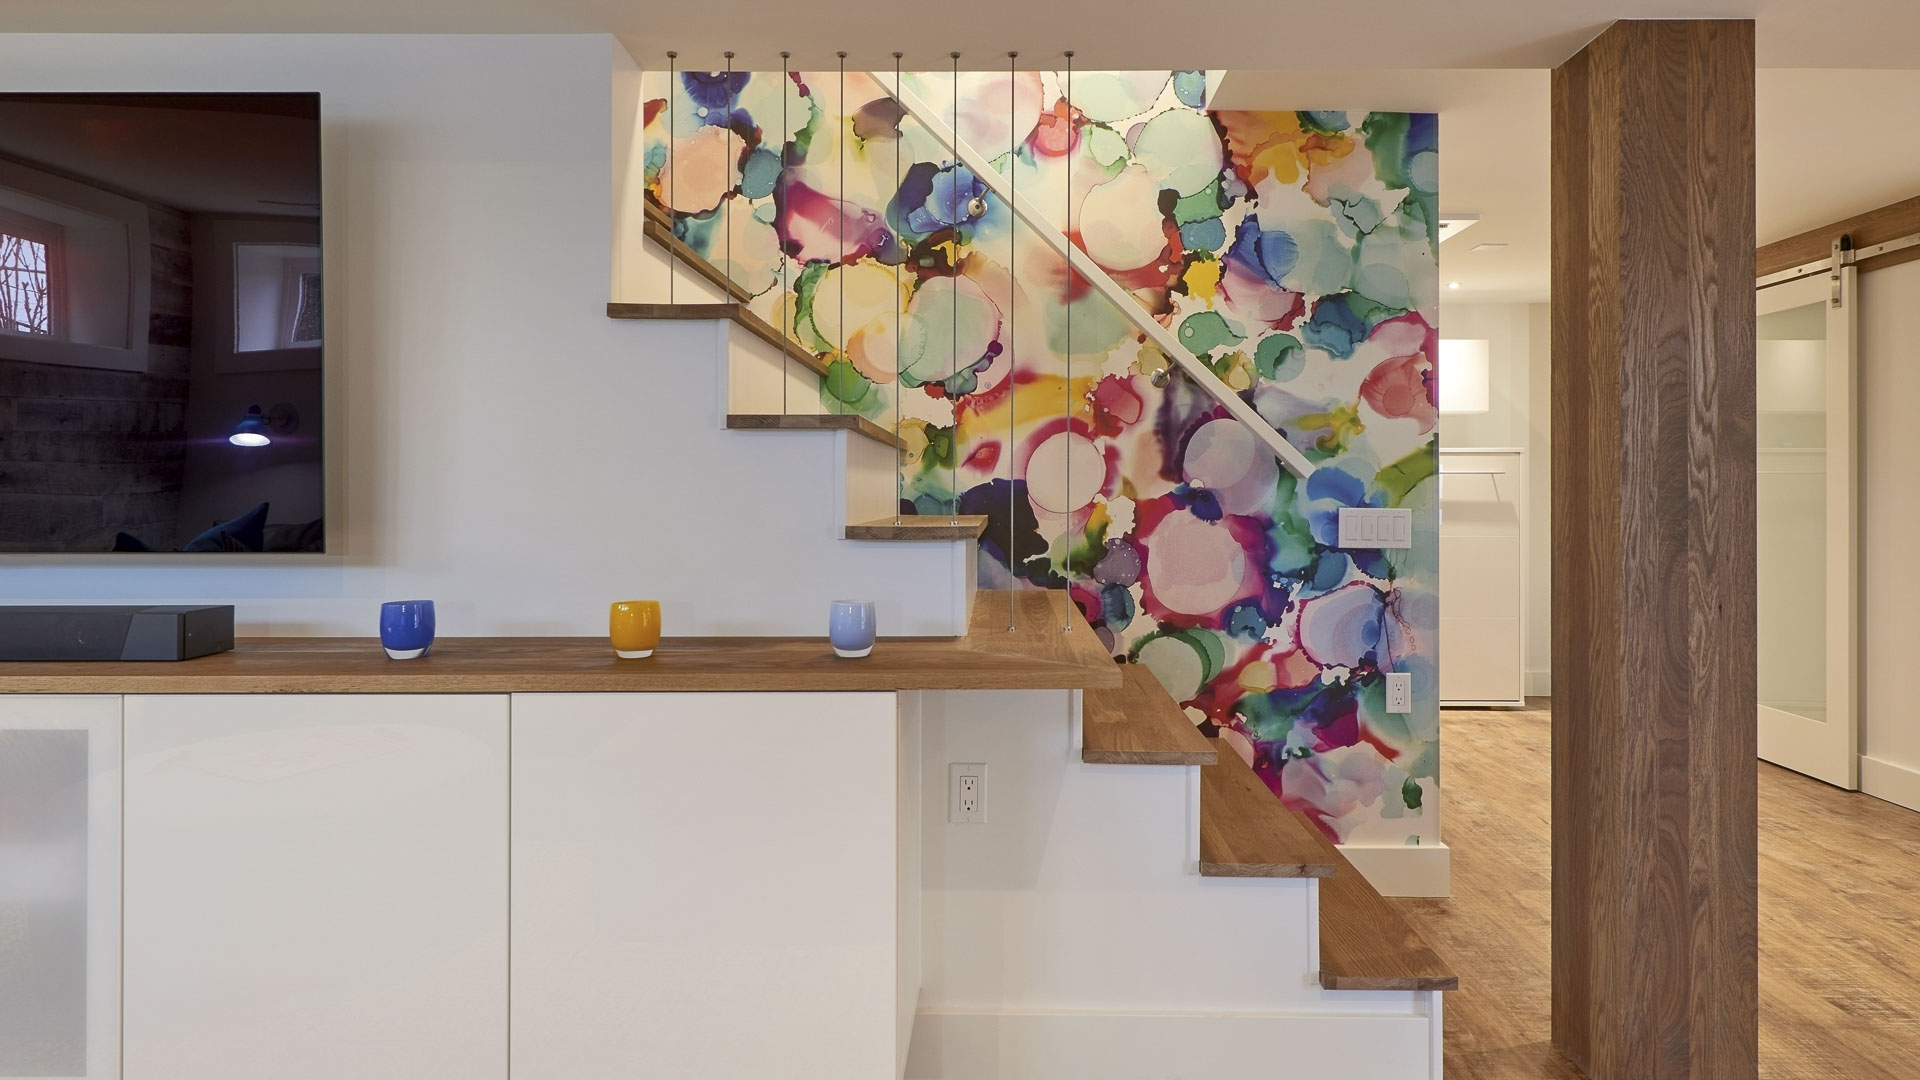 Jackson Design Build - Lisa Price - Muench Basement